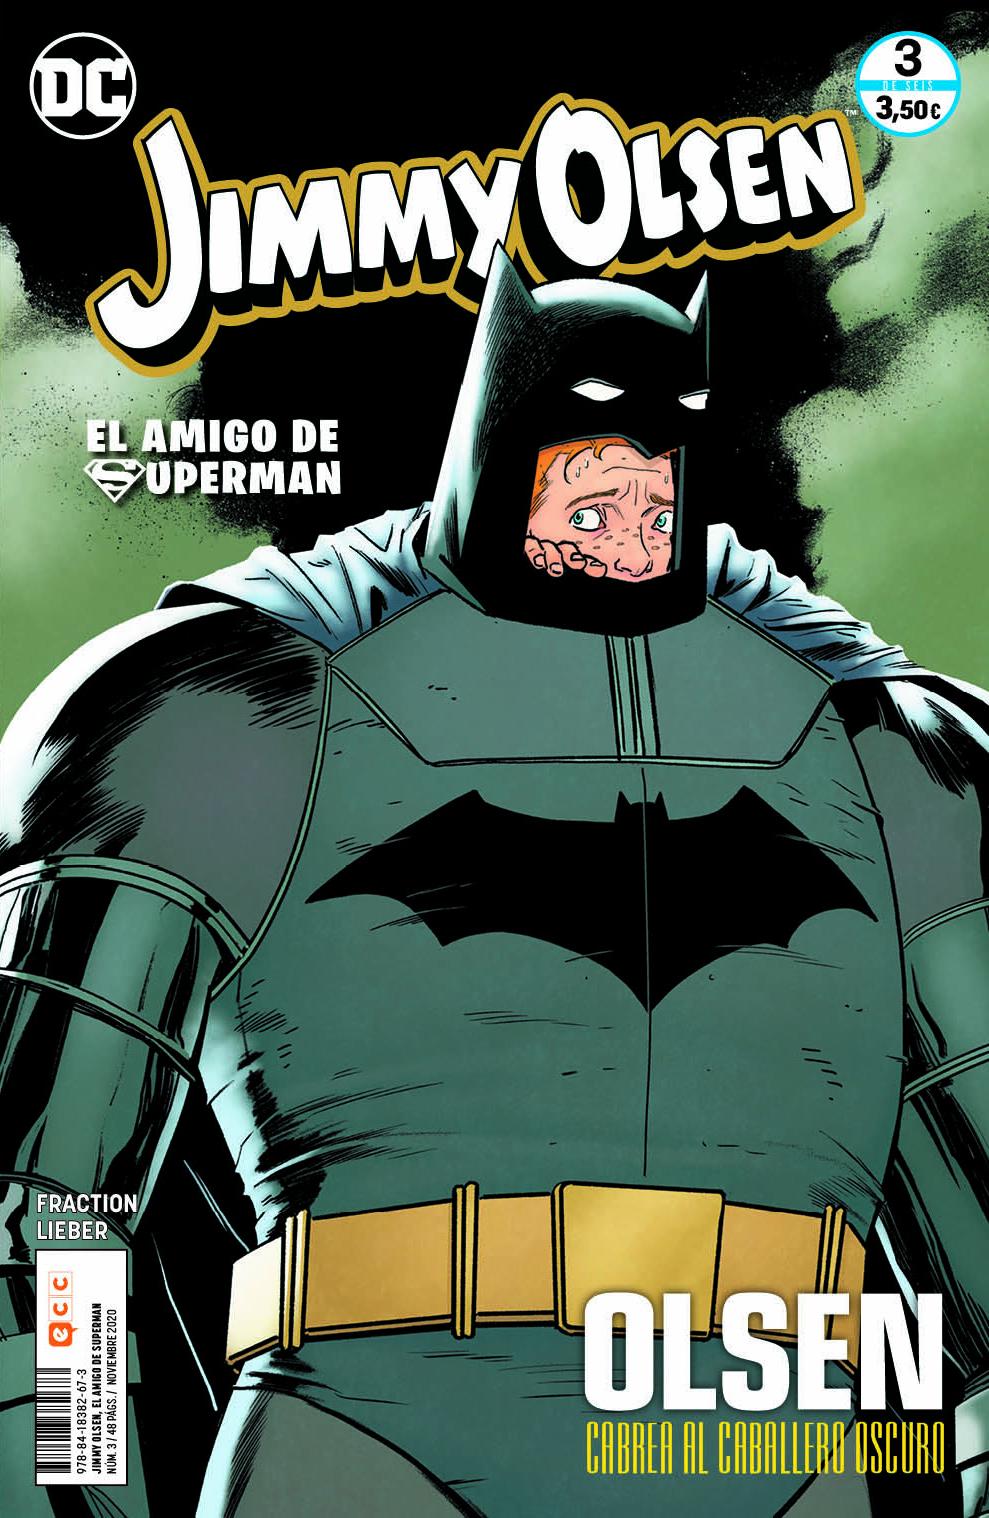 Jimmy Olsen, el amigo de Superman núm. 03 de 6